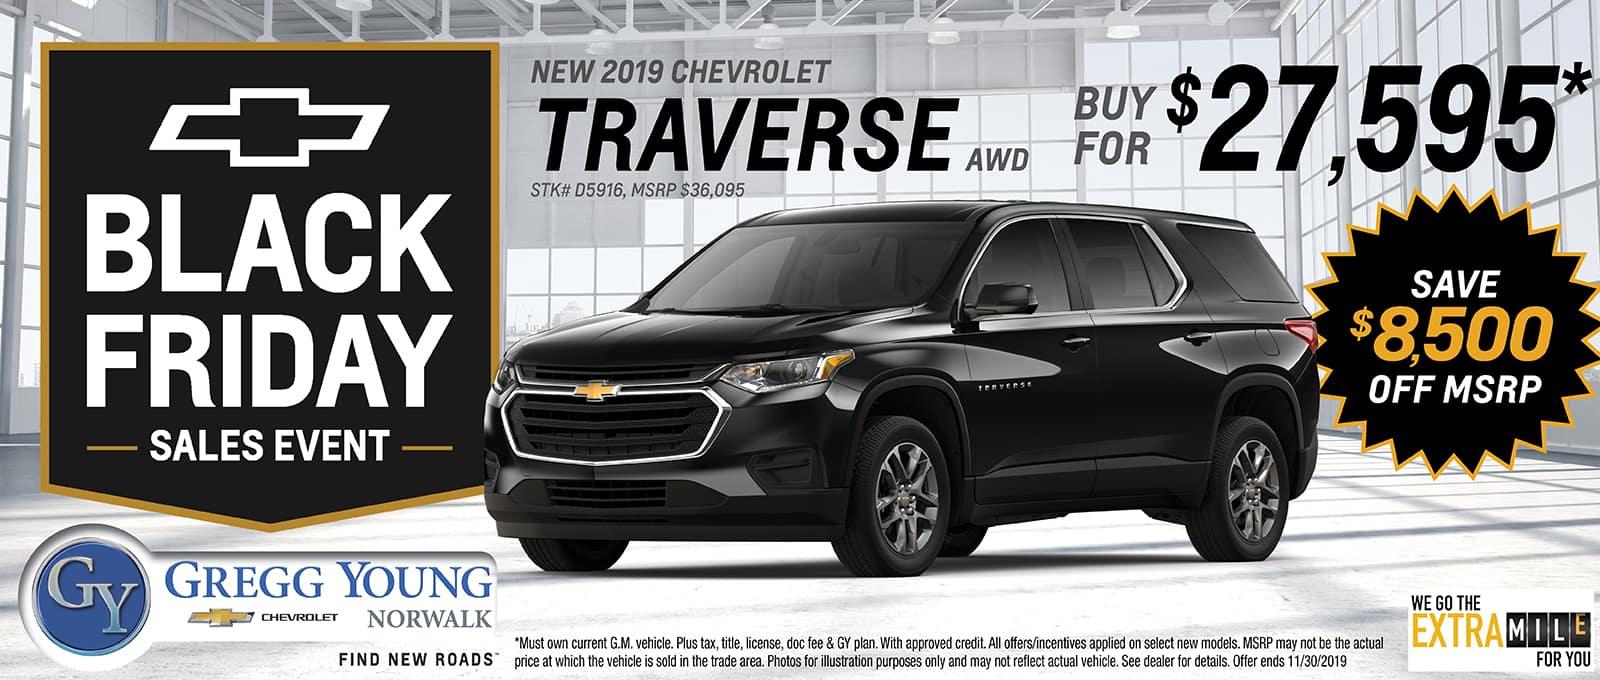 2019 Chevy Traverse